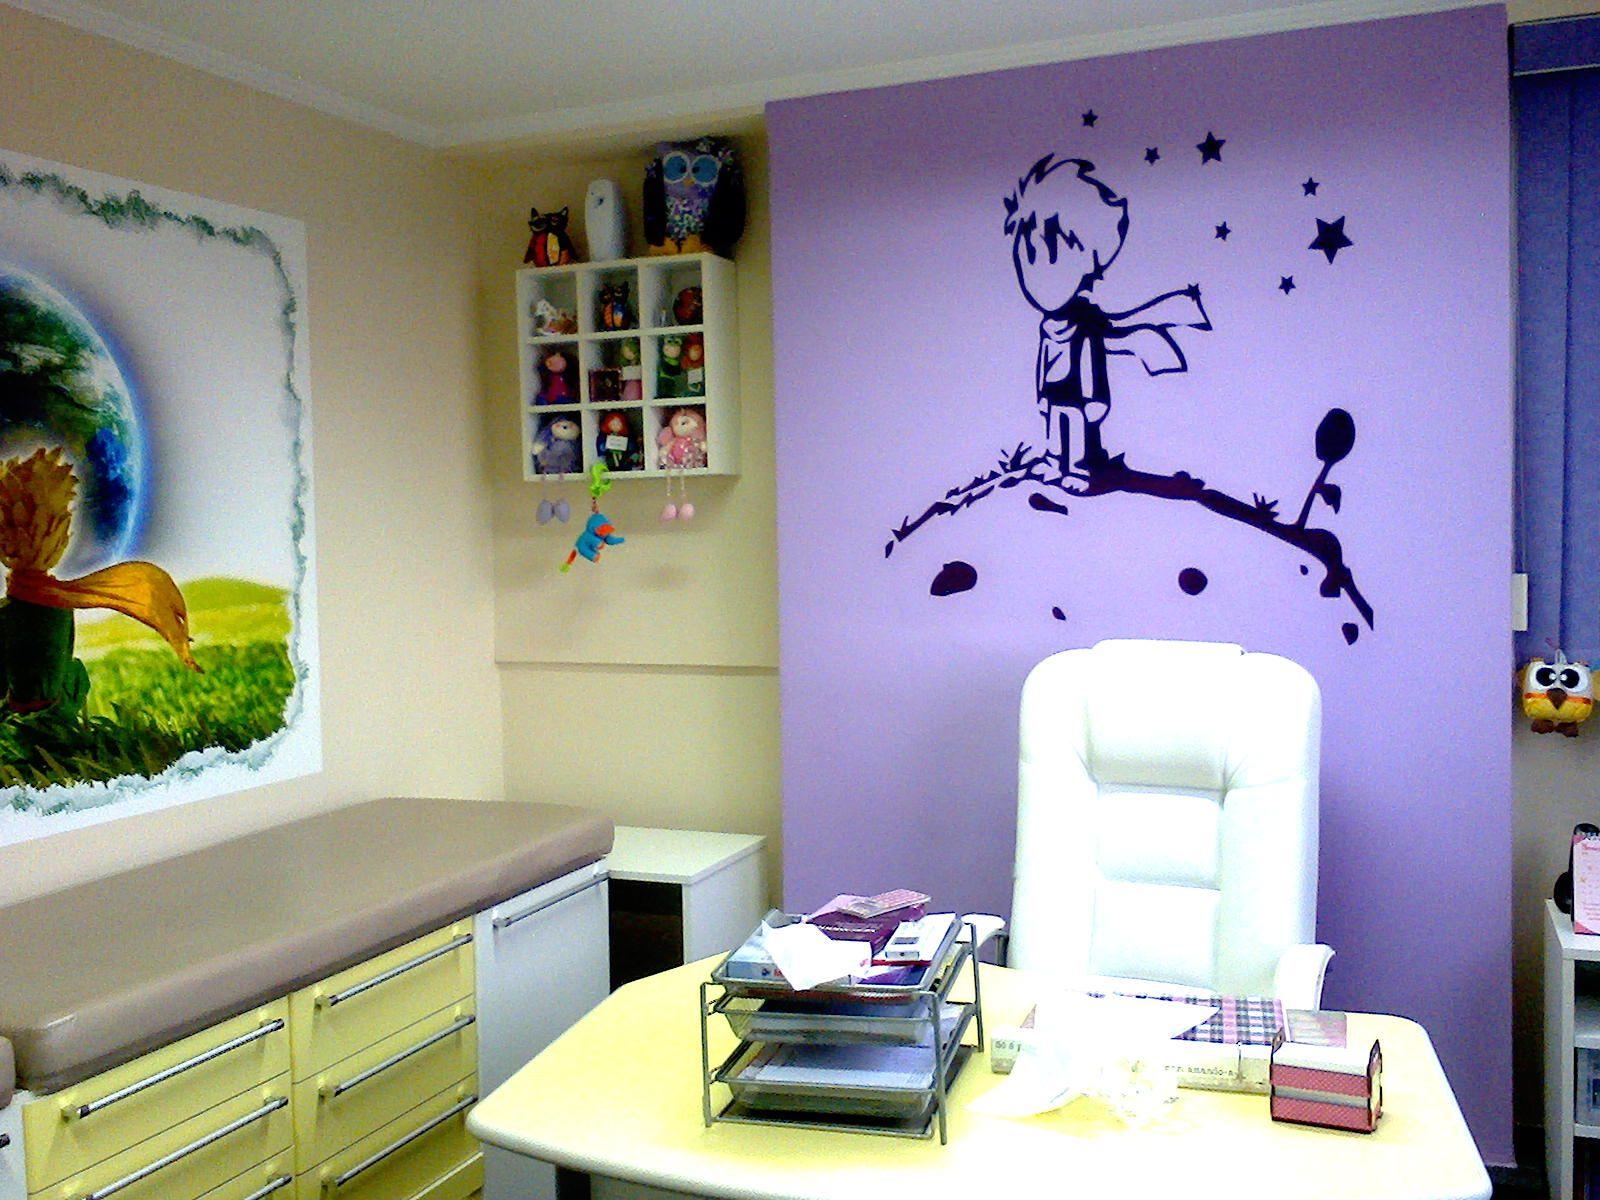 logo pintado de consultório - Pequeno Príncipe